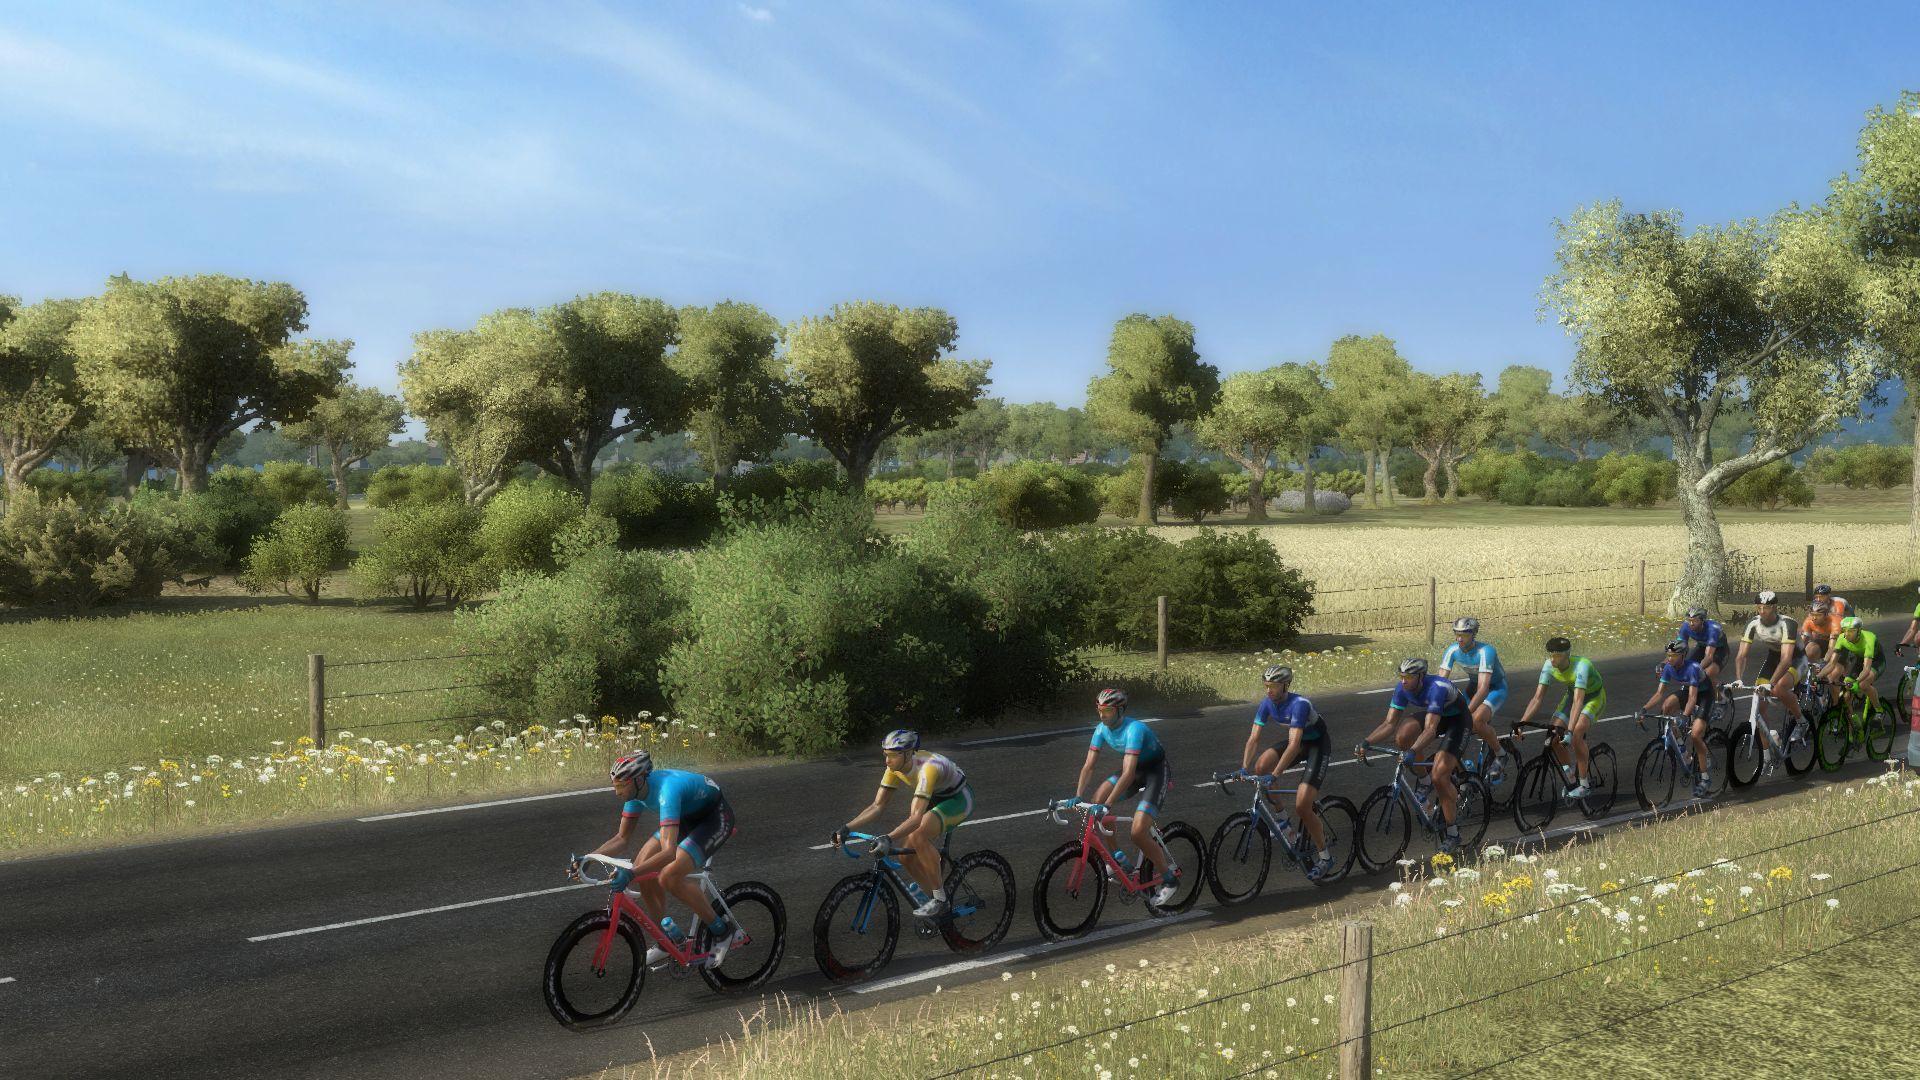 pcmdaily.com/images/mg/2019/Races/PT/Tirreno/mg19_ta_s07_11.jpg